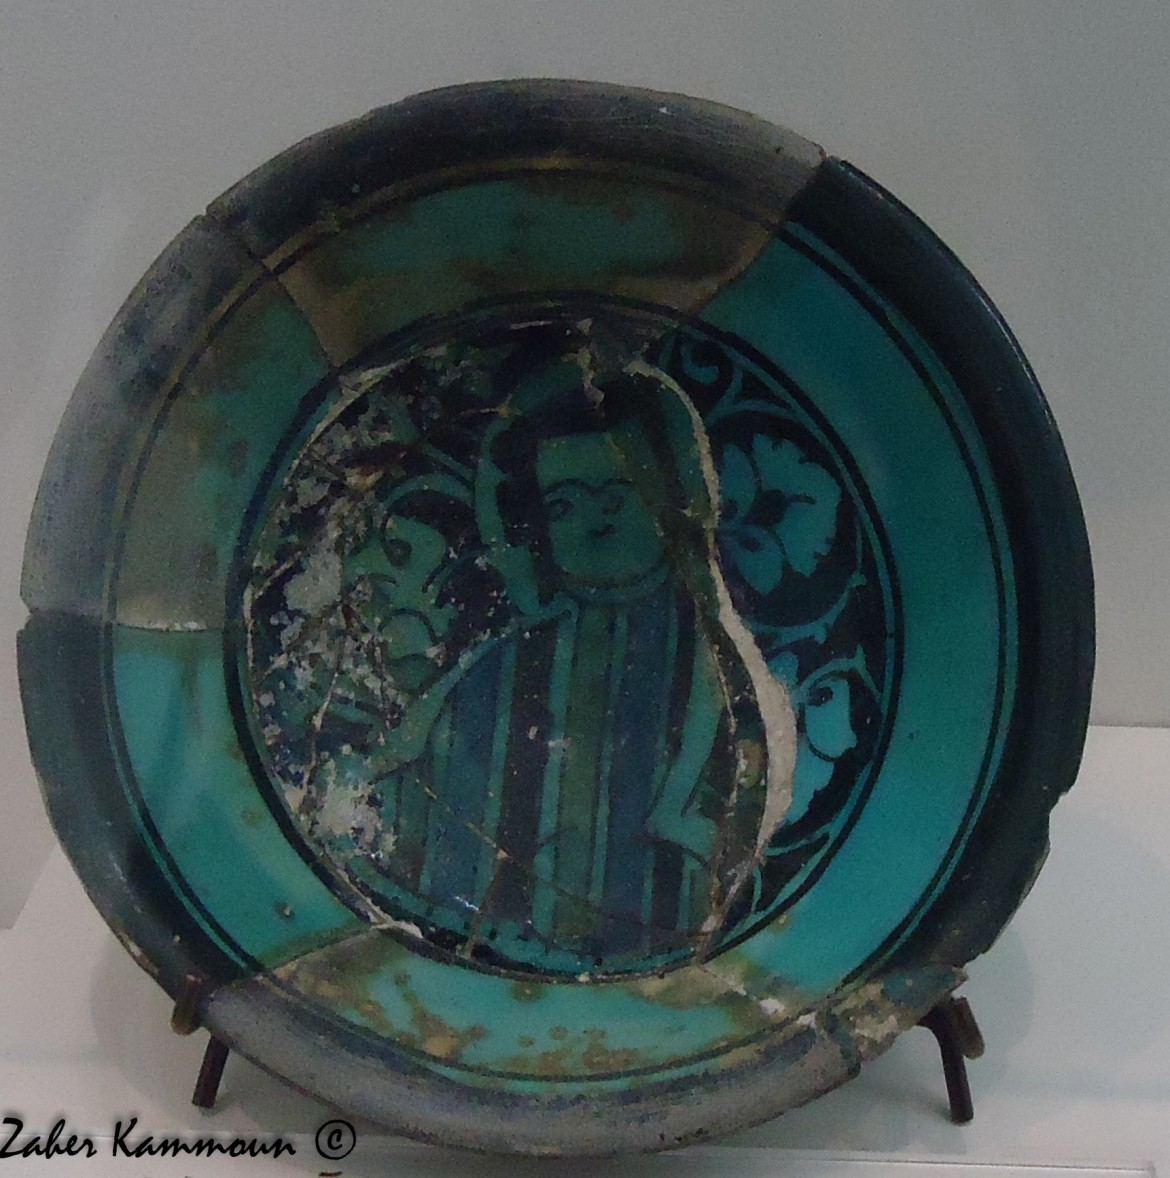 Céramique fatimide